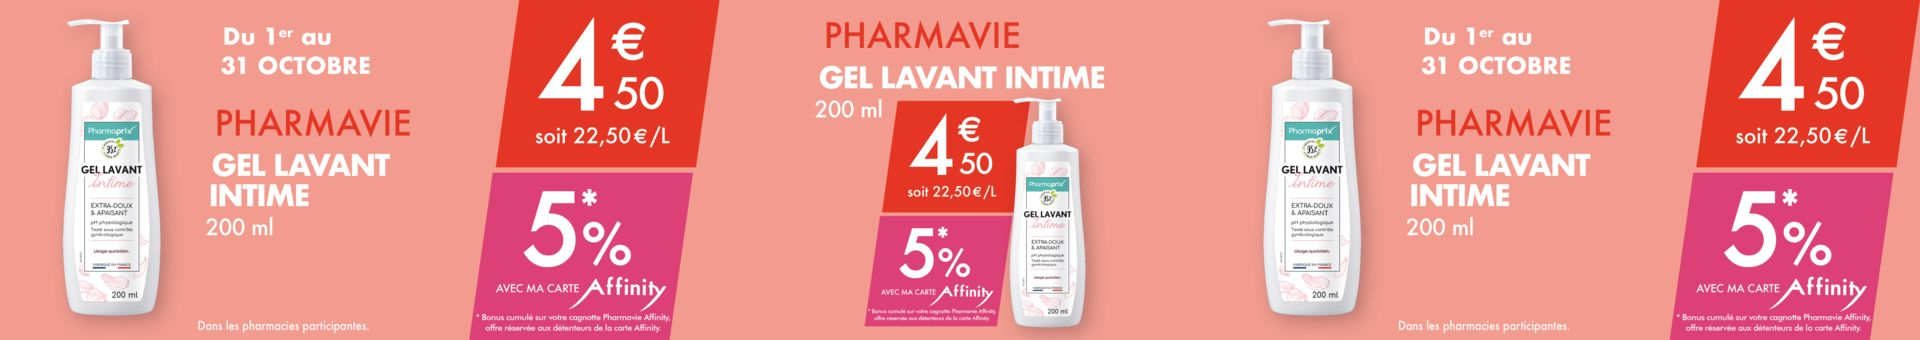 Pharmacie Puig - Leveille,SAINT-MARCEL